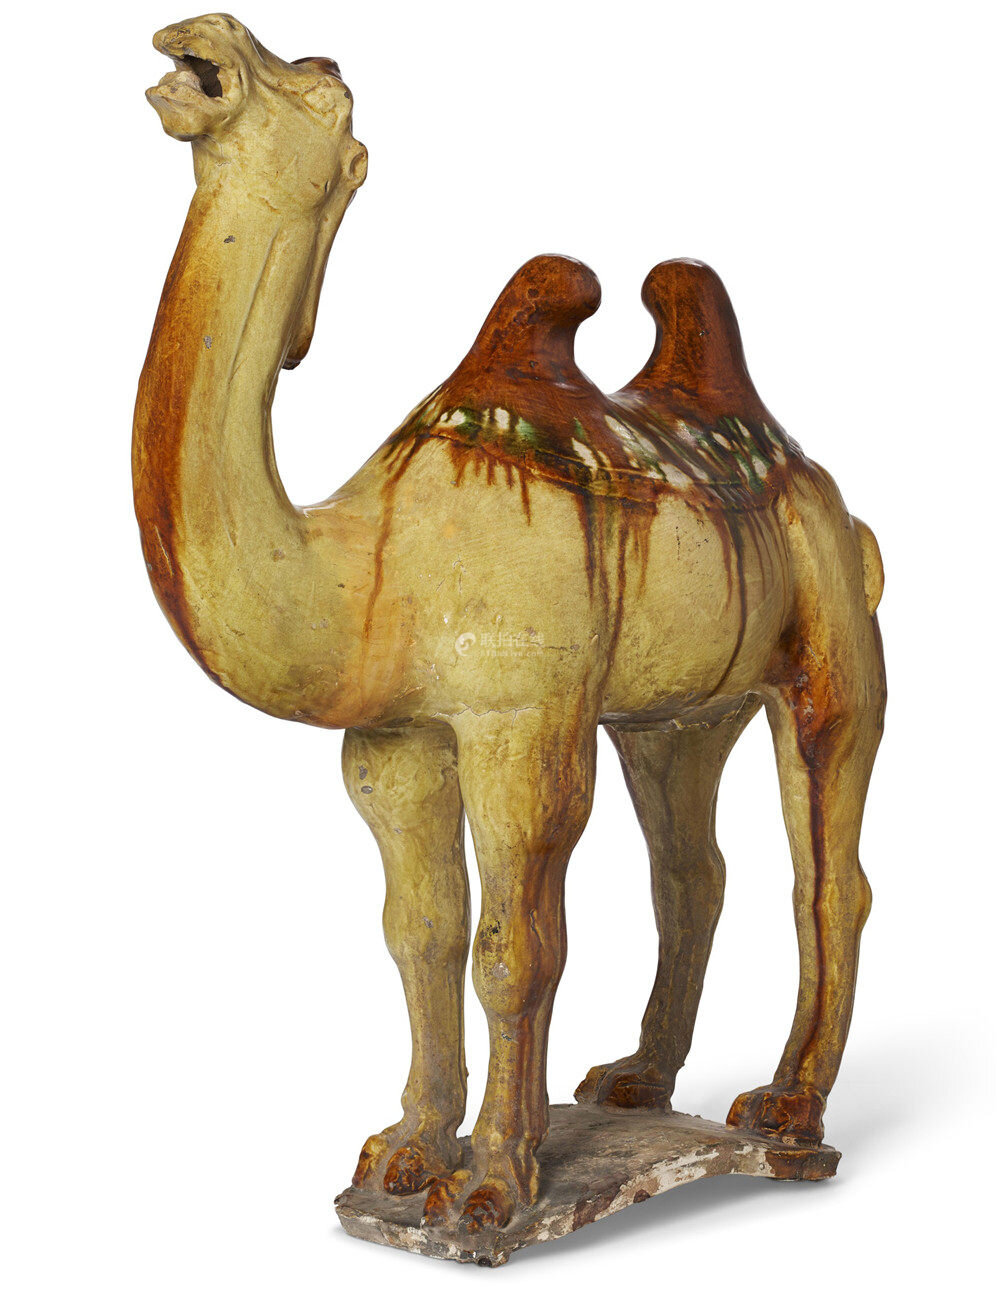 A sancai-glazed pottery figure of a Bactrian camel, Tang dynasty (AD 618-907)